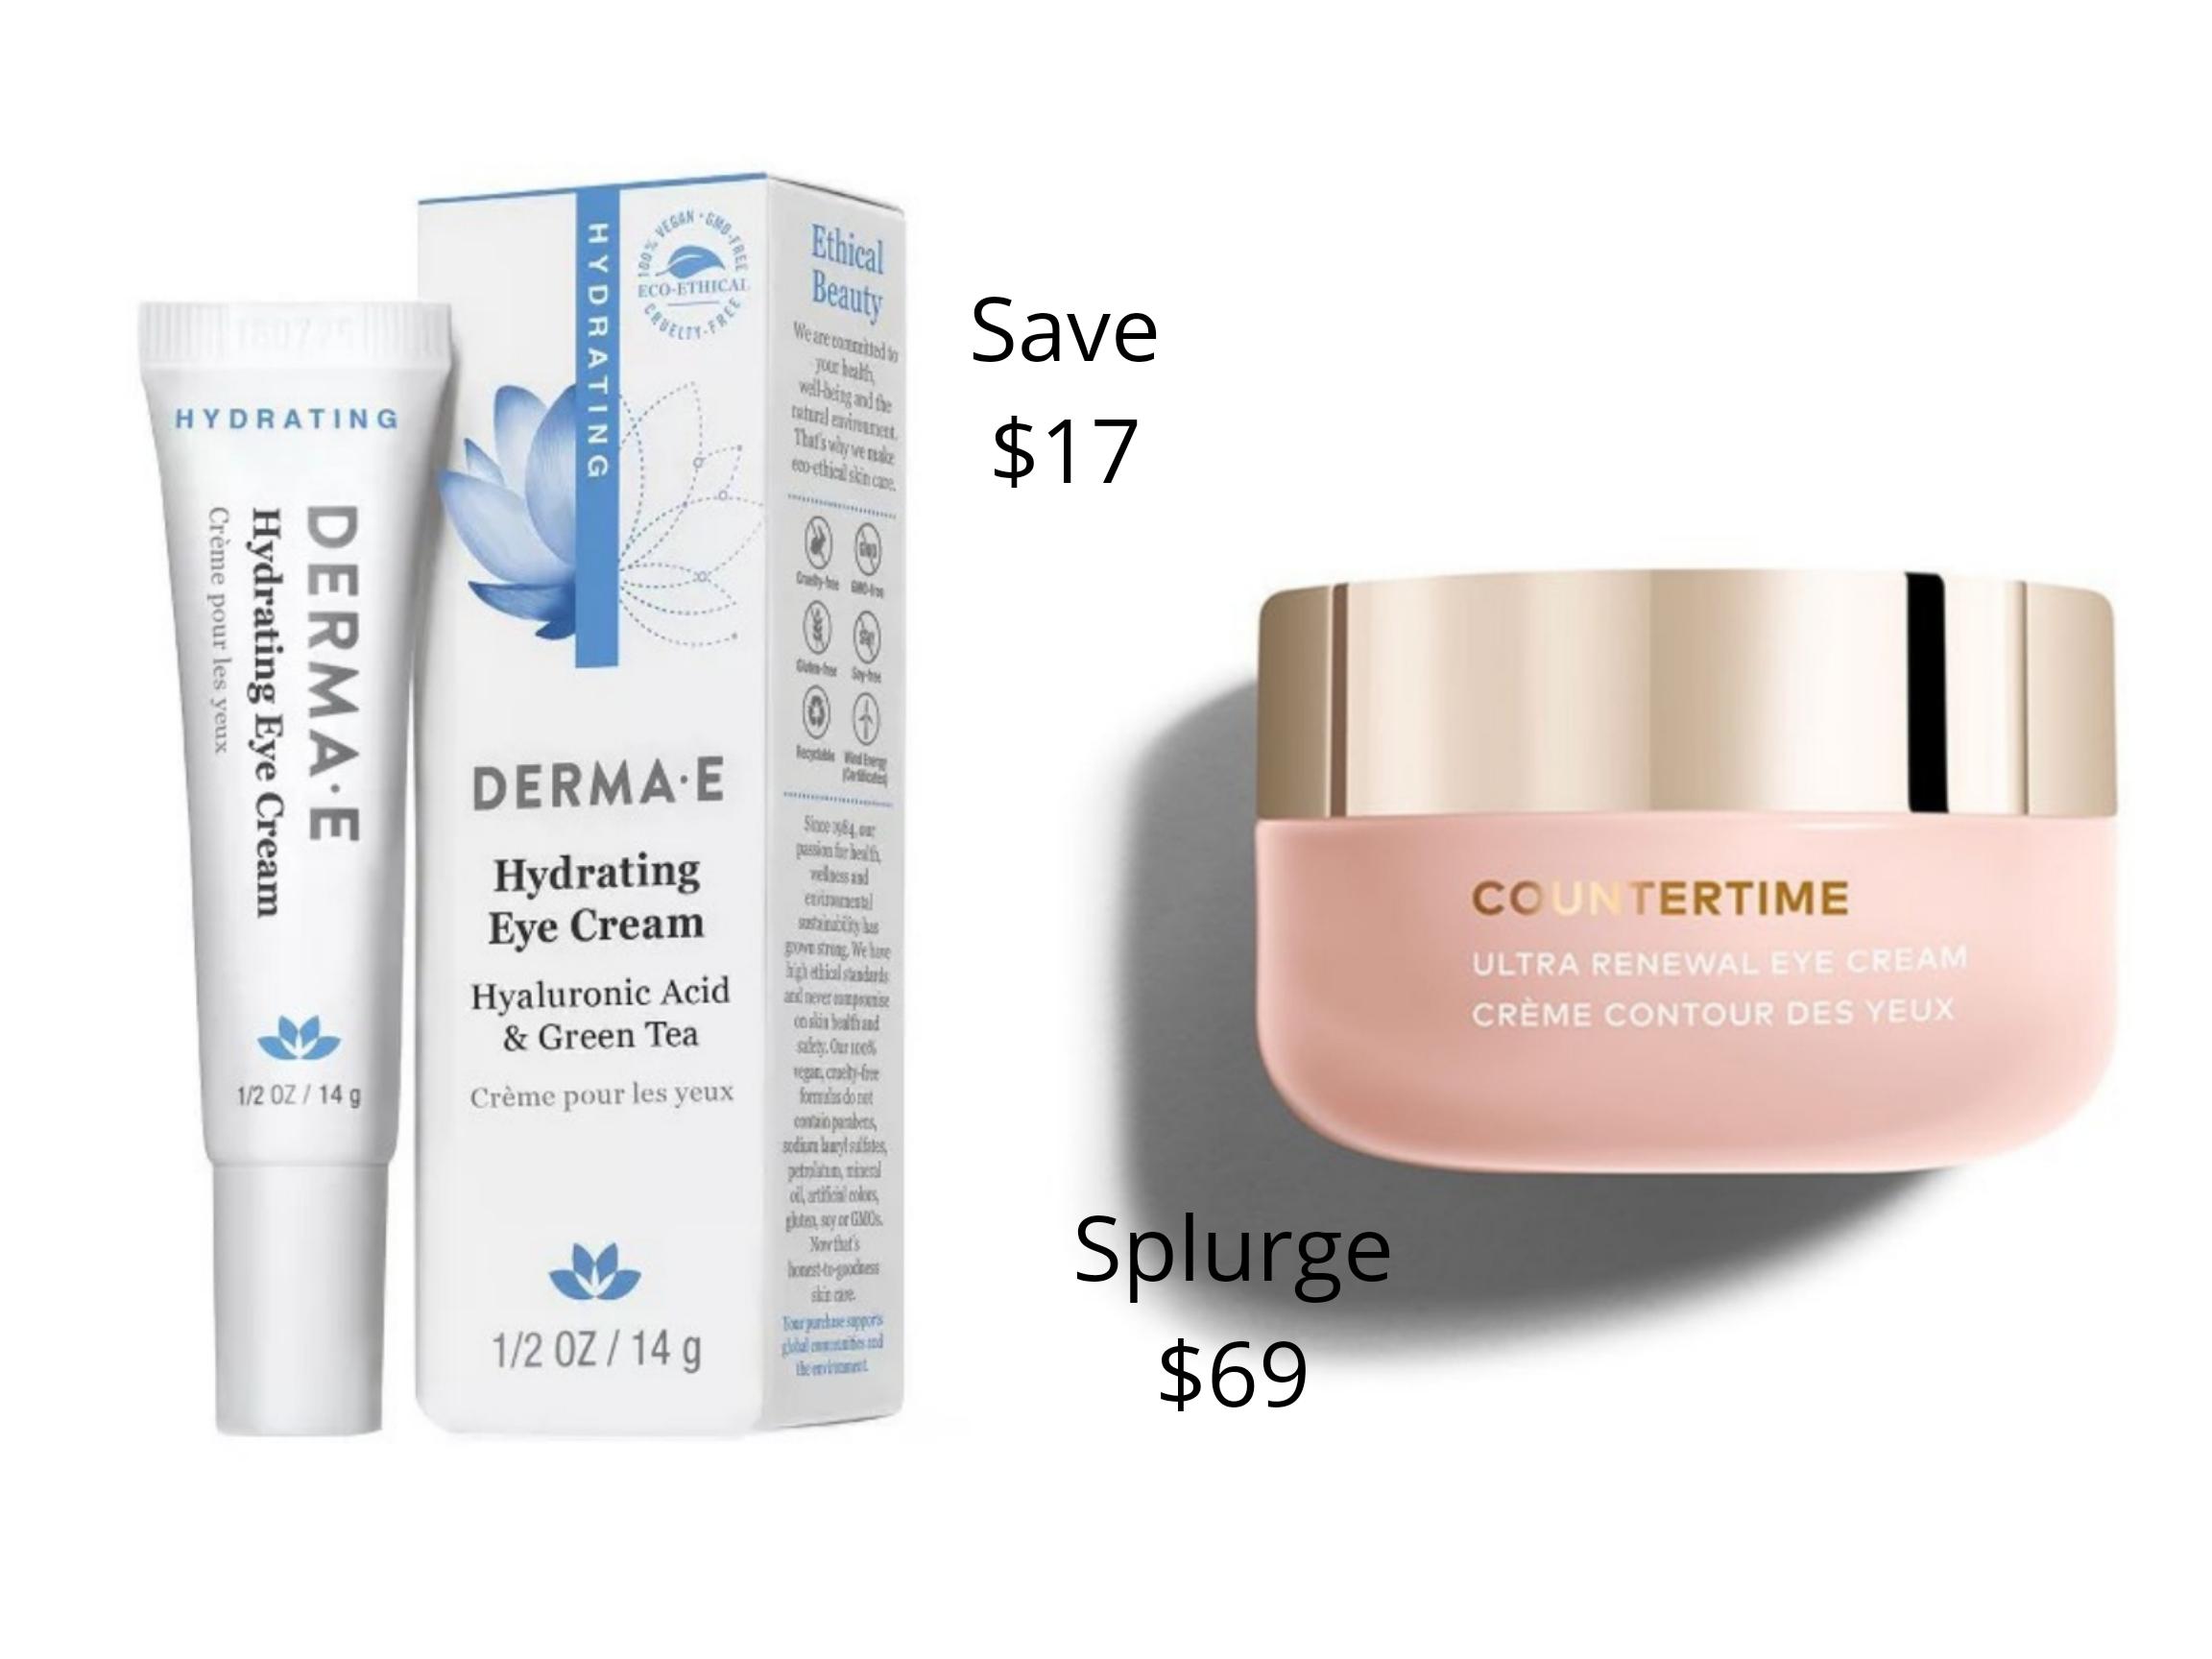 Orlando Beauty Blogger Emily of Fabulously Overdressed shares her favorite save vs splurge eye creams.